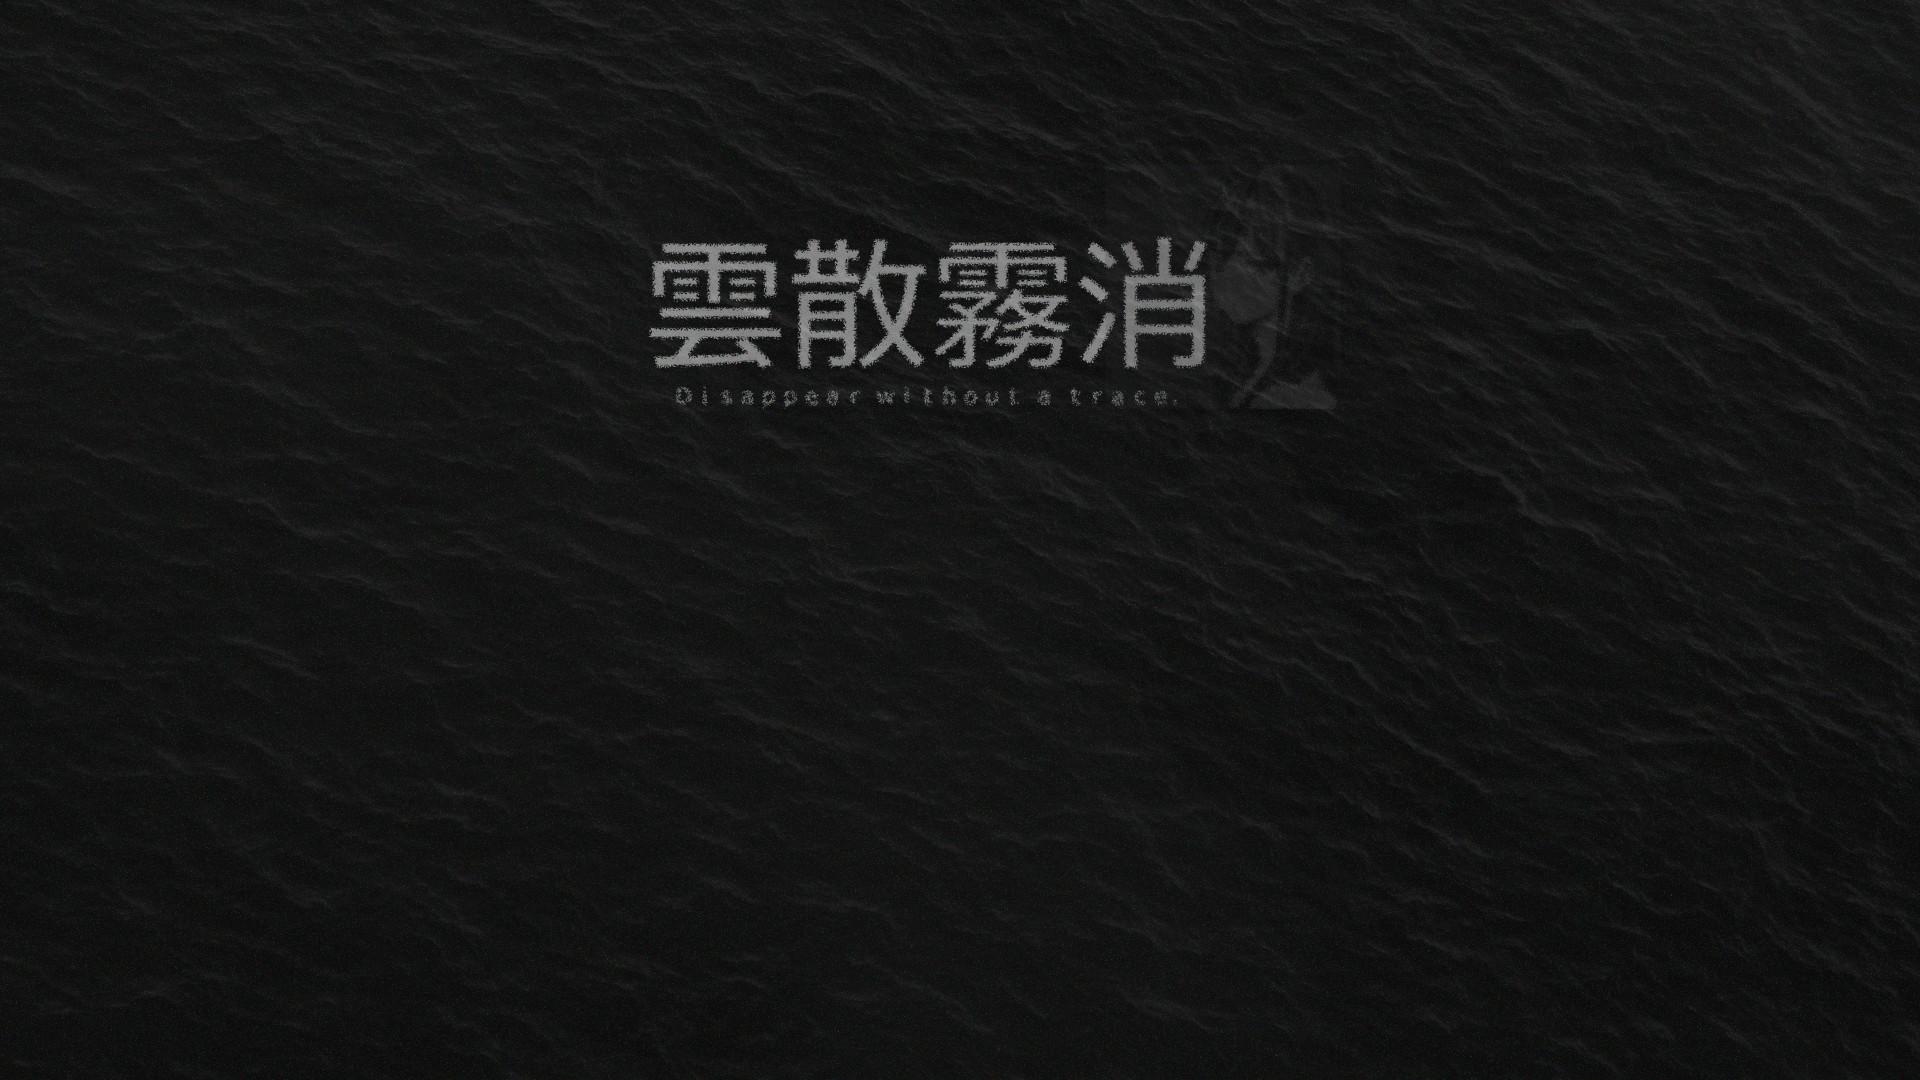 Aesthetic Depressing Black Tumblr Wallpaper